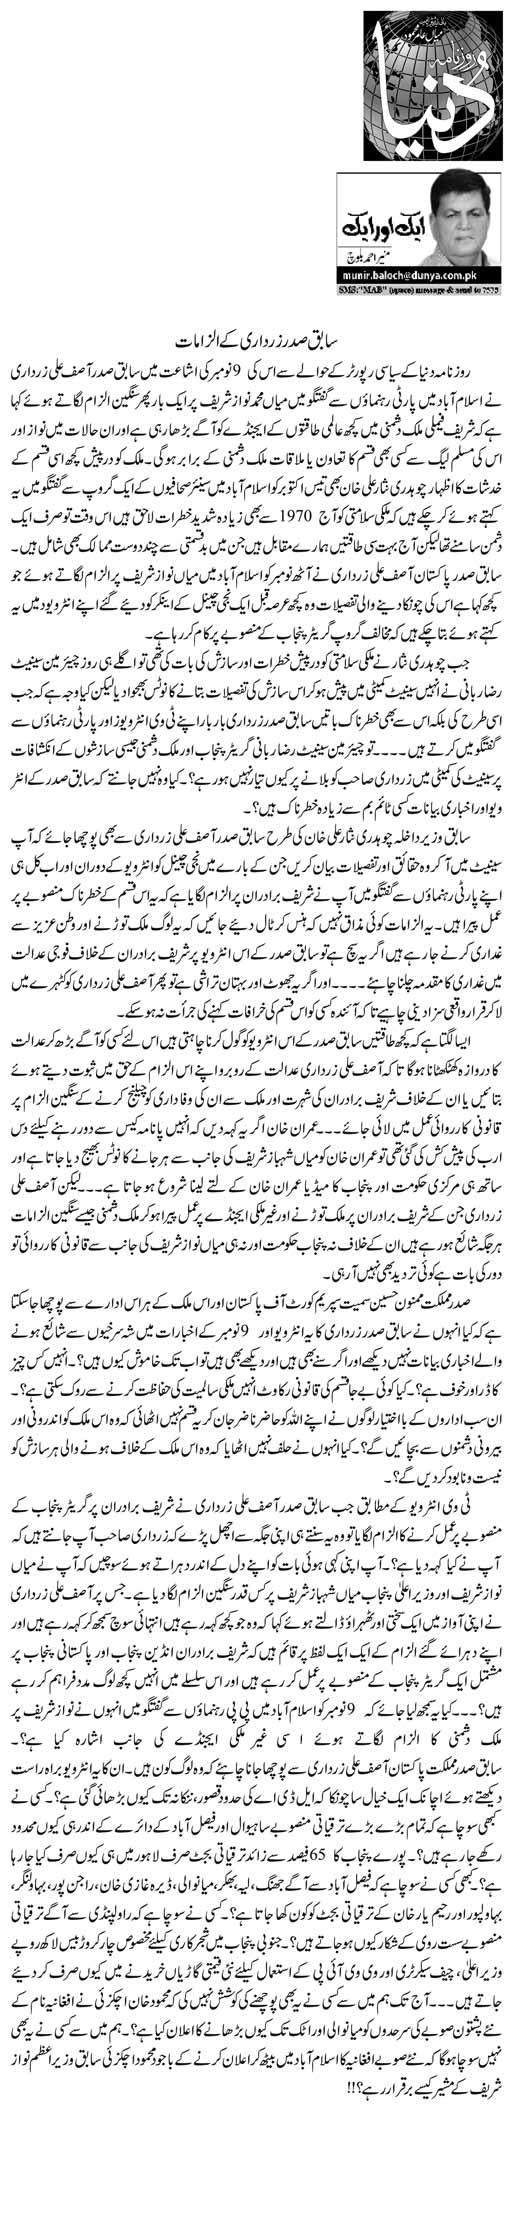 Sabiq Sadar Zardari Ke Ilzamat | Munir Ahmad Baloch | Daily Urdu Columns